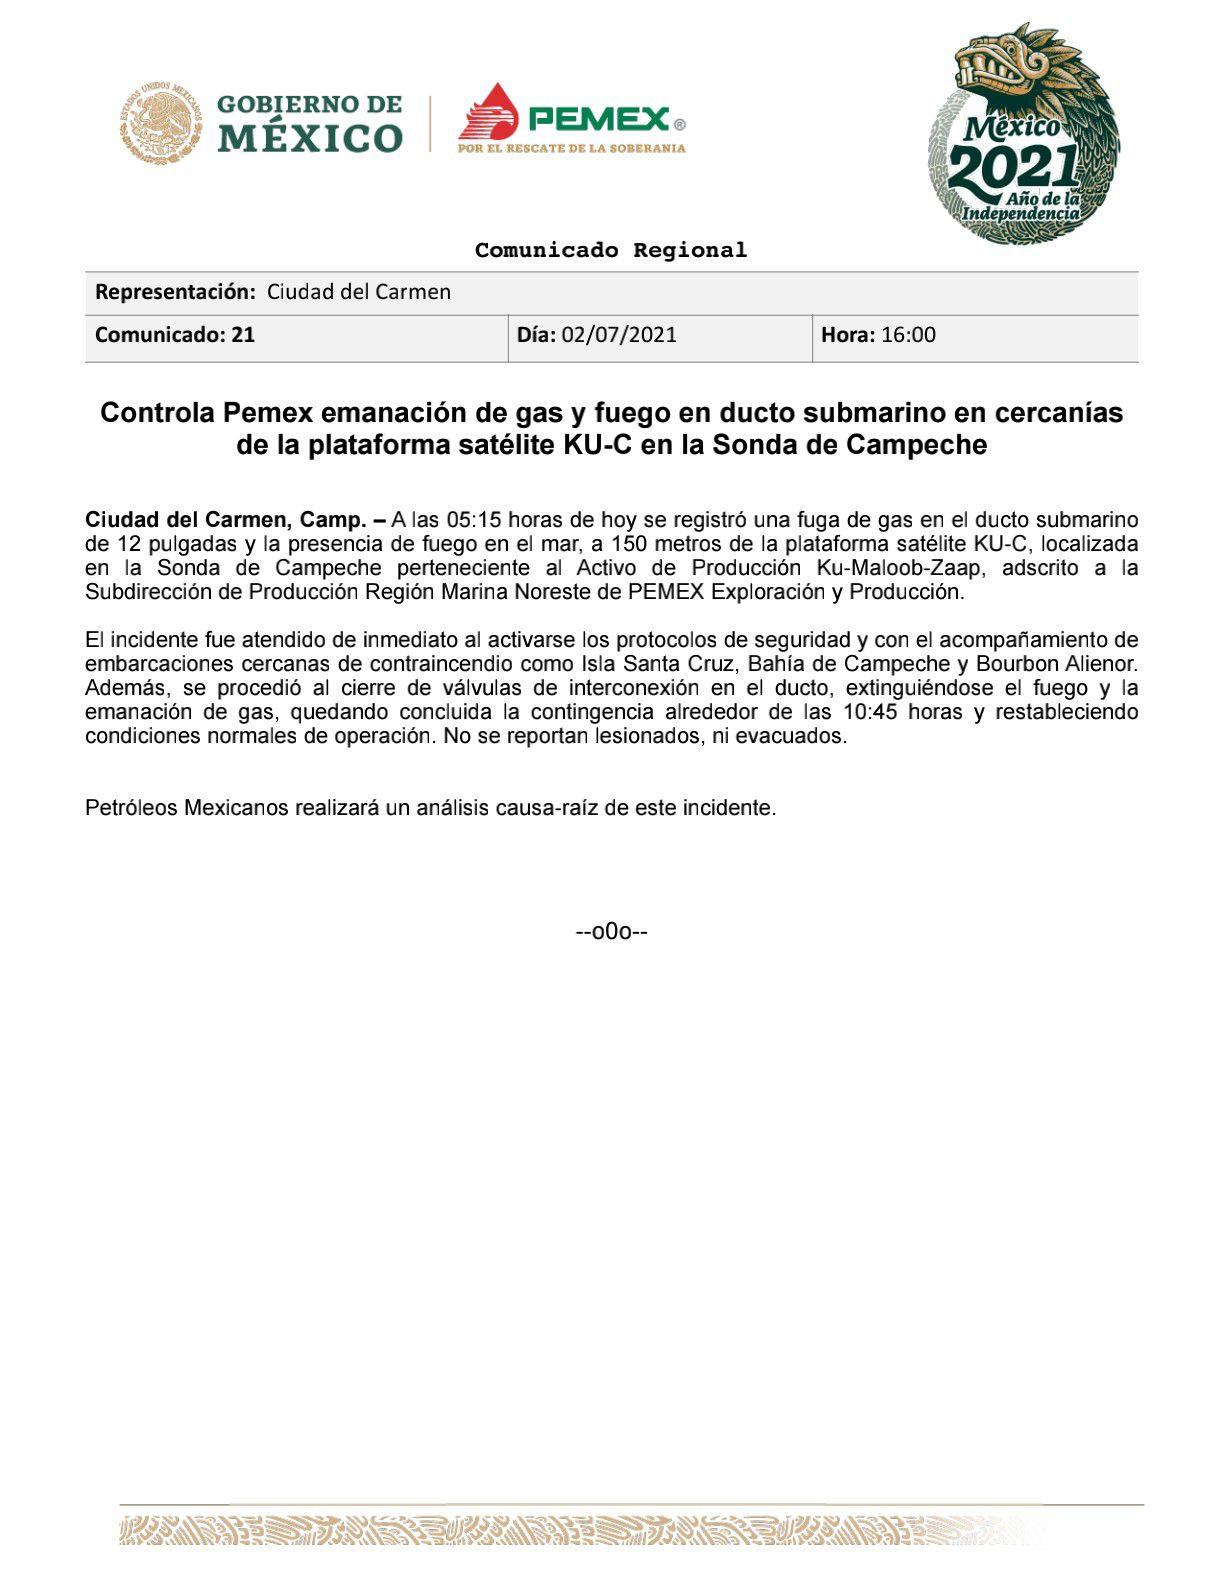 Incendio en Campeche Pemex